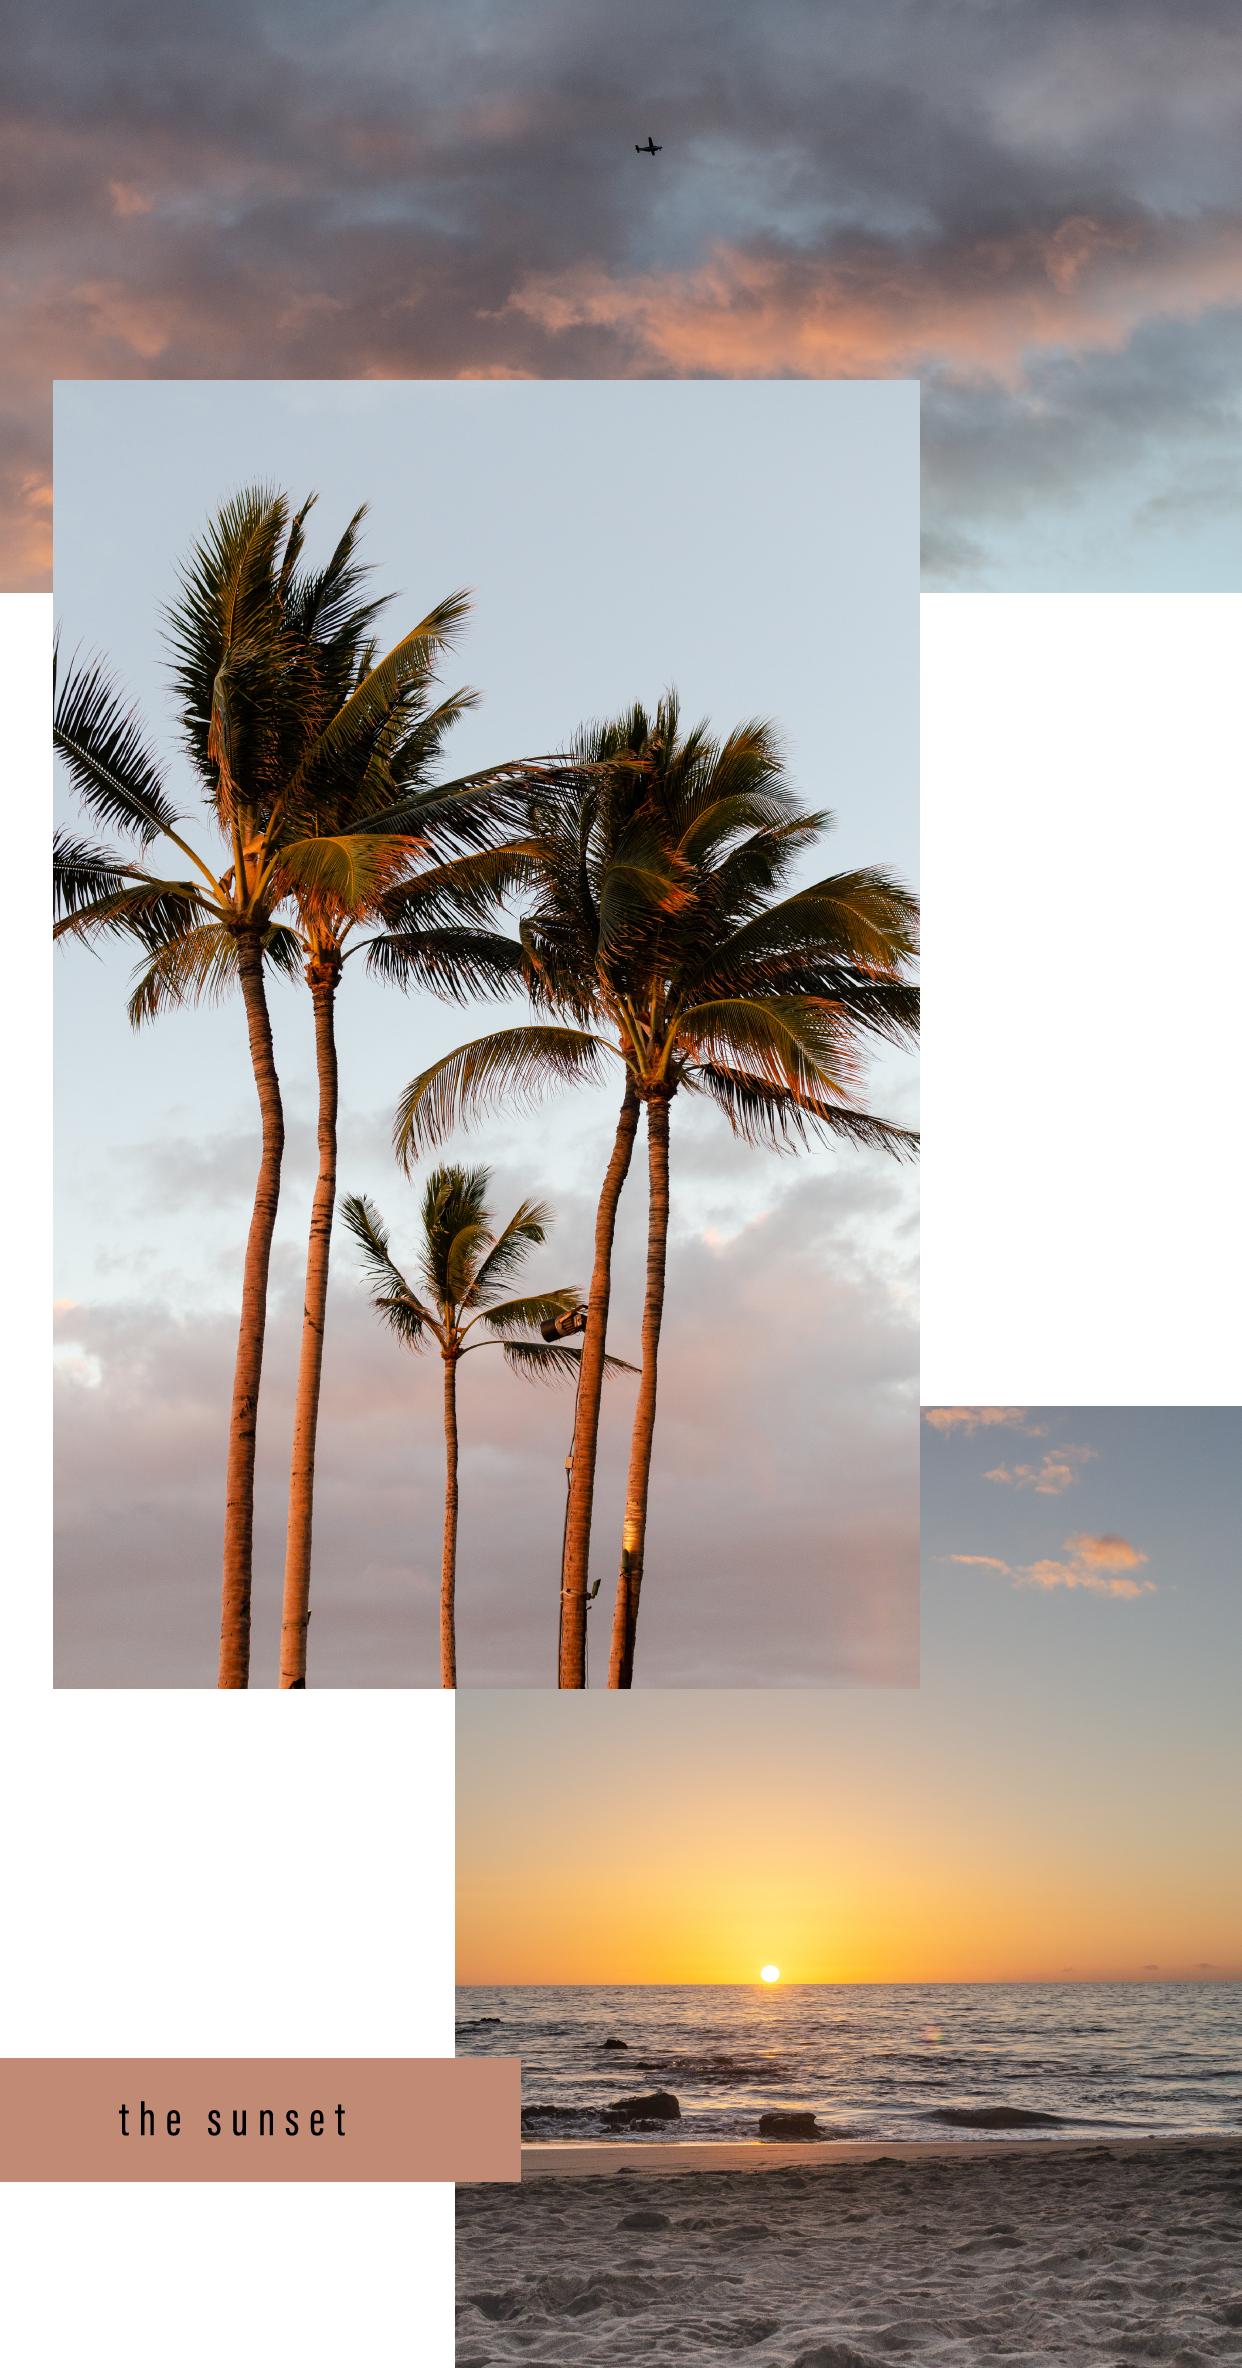 Bottega-x-Hawaii_The-Sunset.png